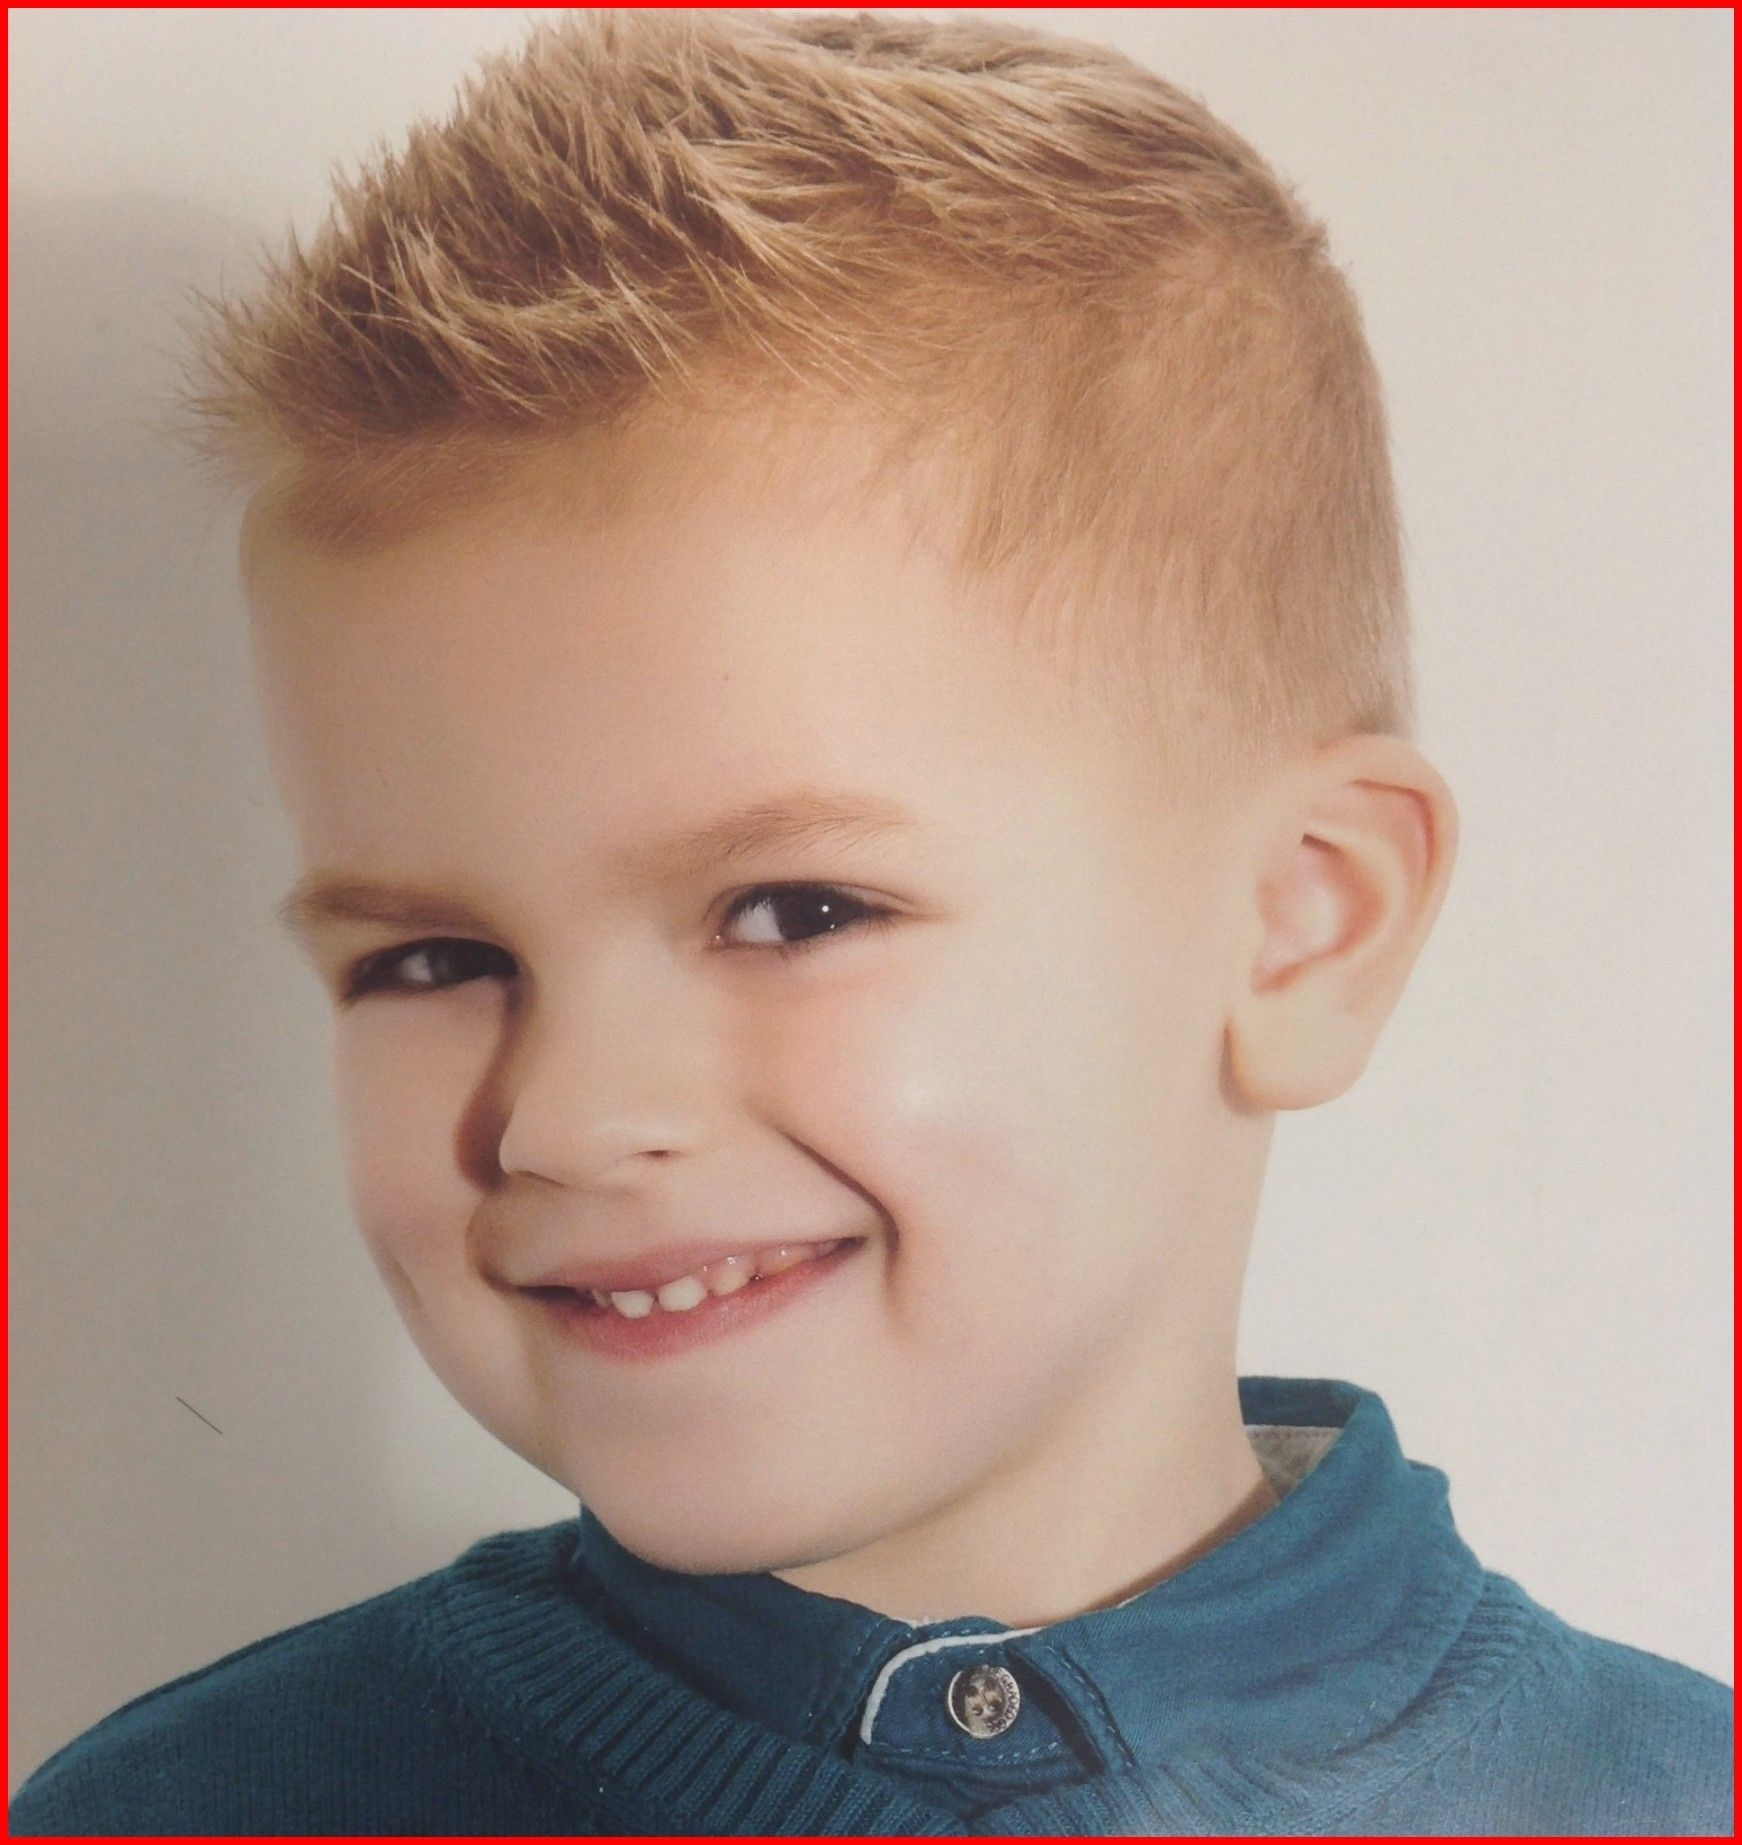 9 Year Old Boy Haircuts 2016 - The Best  | Landon Haircut In 2019 throughout 9 Yearold Boy Haircuts